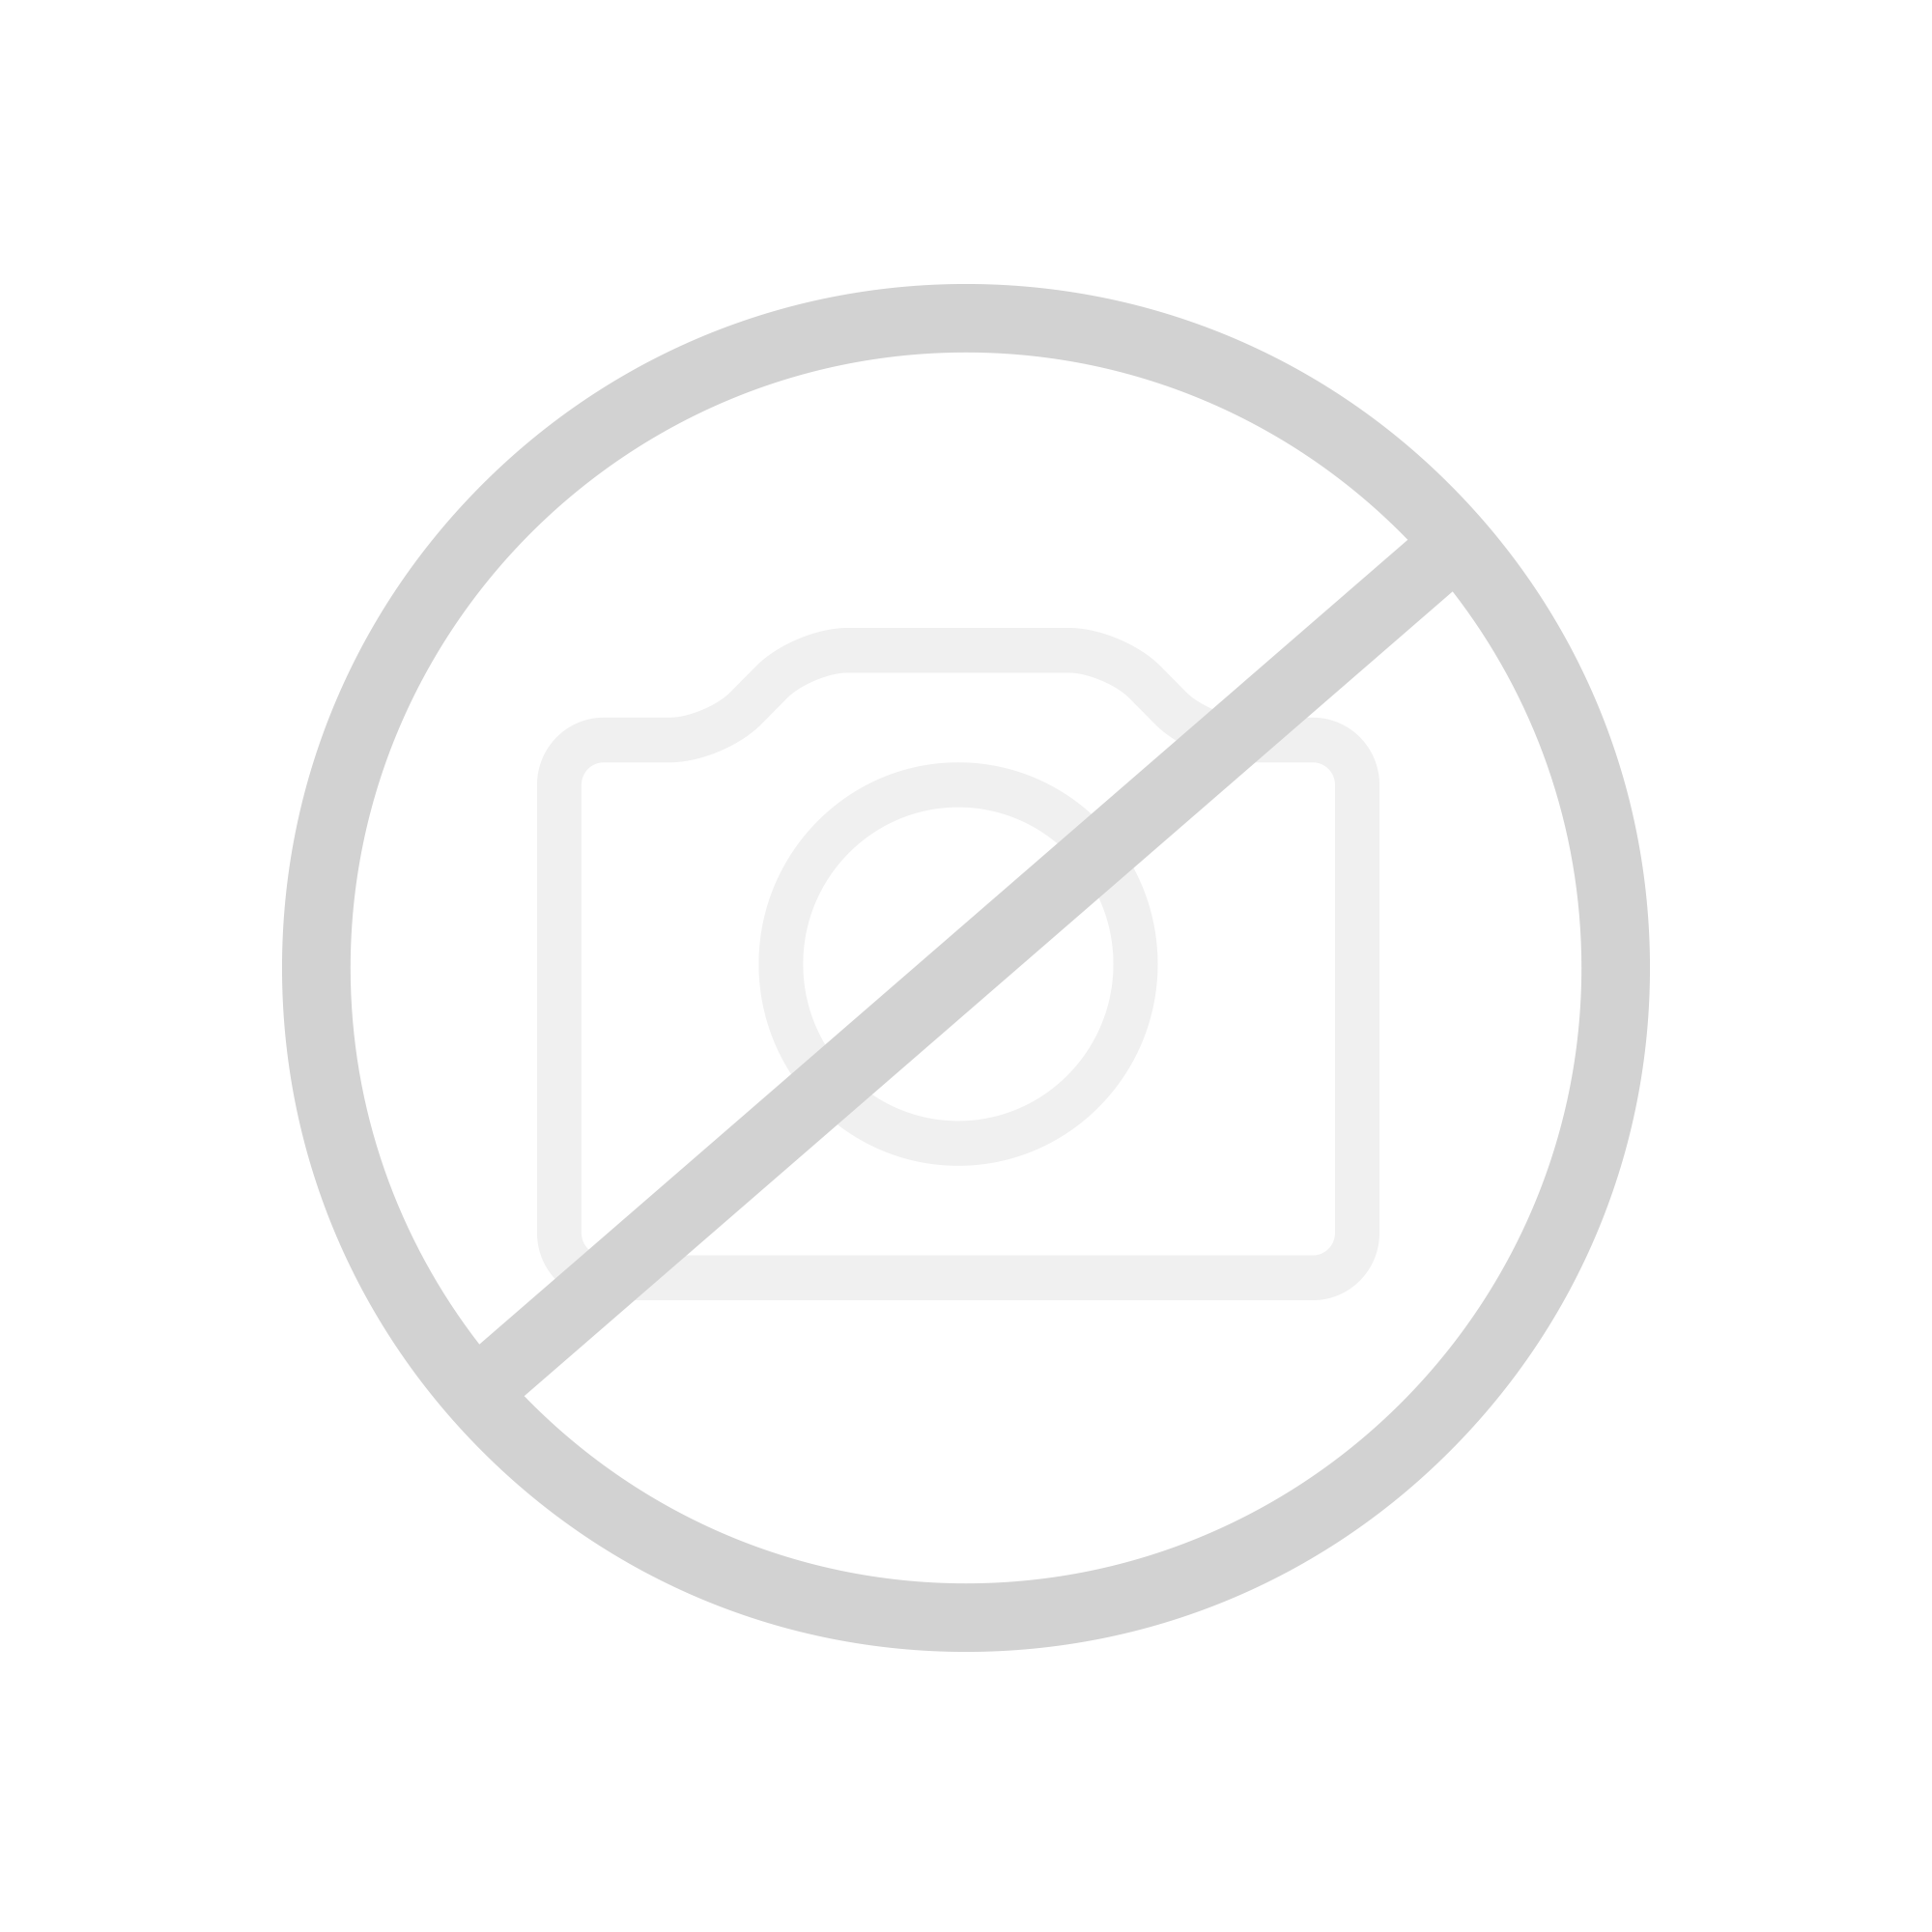 Dornbracht LULU xStream Wannen-Einhandbatterie chrom